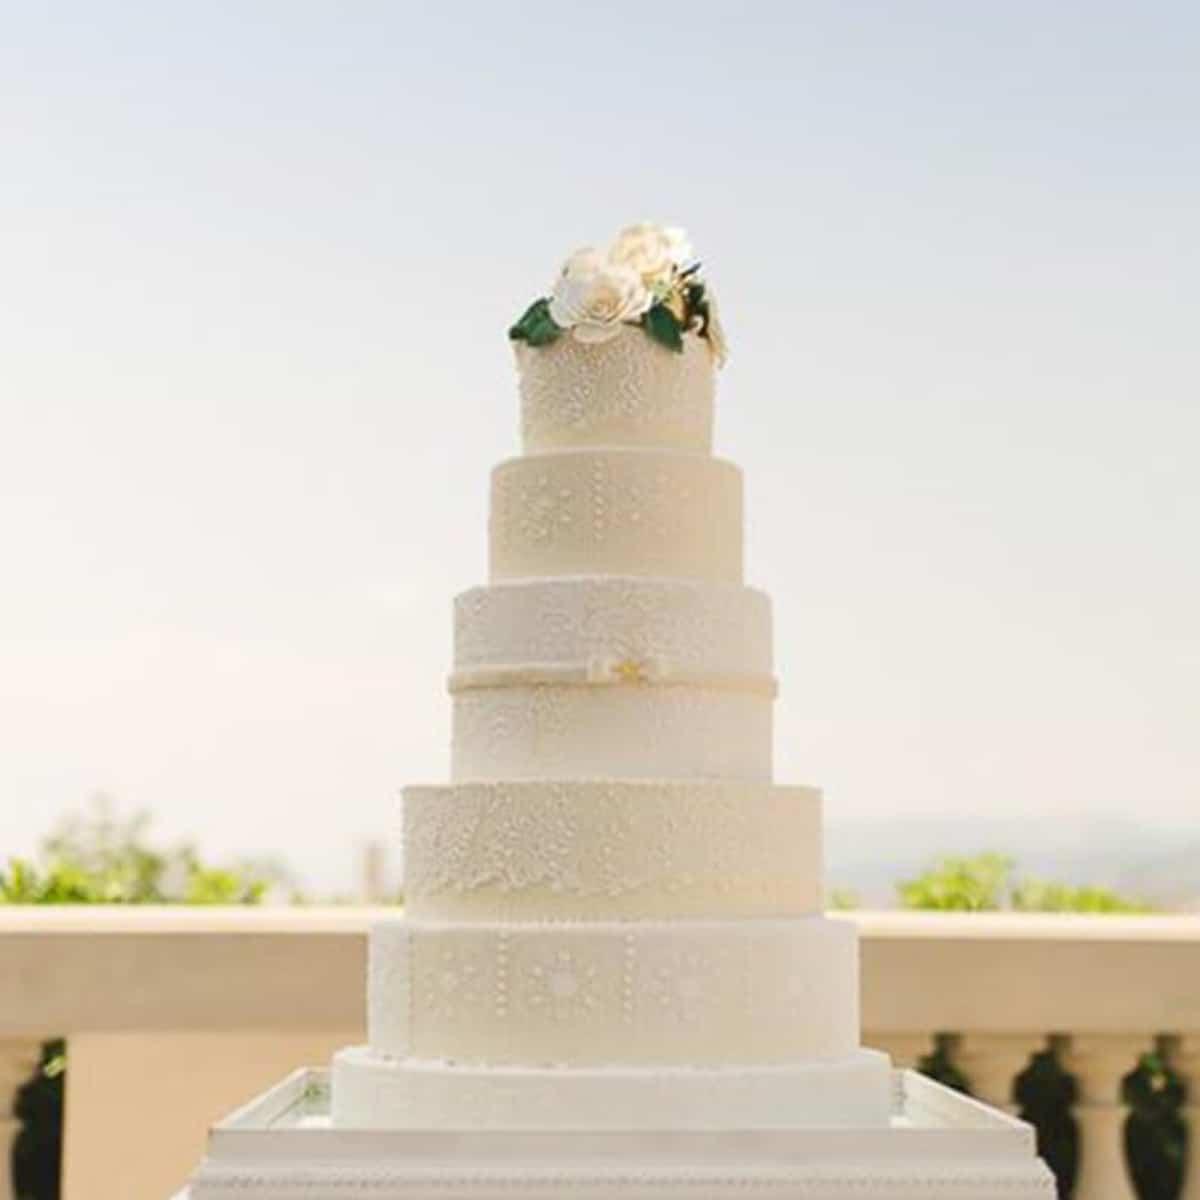 Prissy For Dream Destination Event Italian Wedding Cake Villa Wedding Cakes Italian Wedding Cake Flavor Odnetworkrecipessandra Leeitalian Wedding Cake Recipeindexml wedding cake Italian Wedding Cake